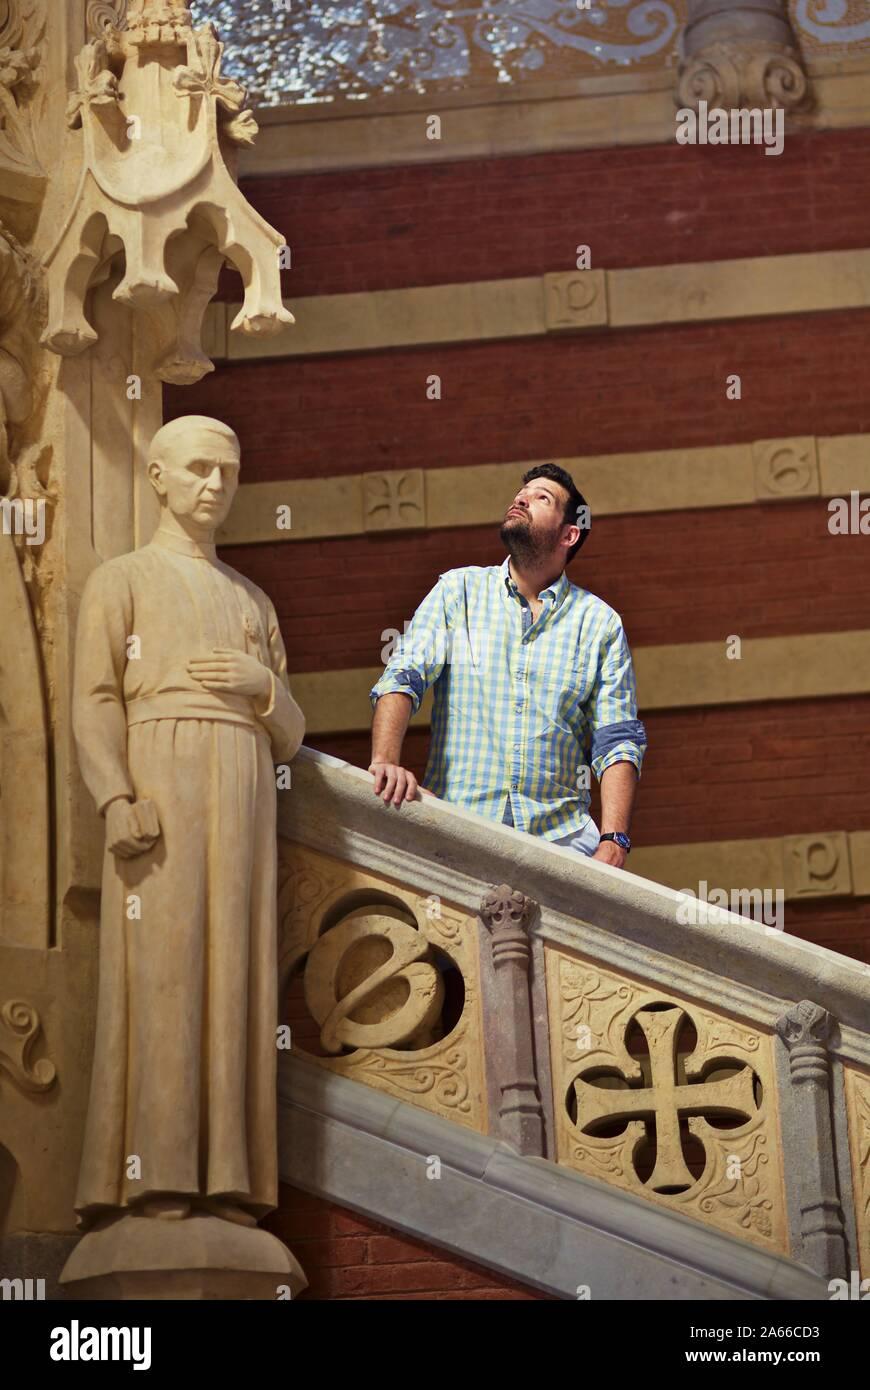 man-posing-on-stairs-inside-recinte-modernista-de-sant-pau-barcelona-2A66CD3.jpg